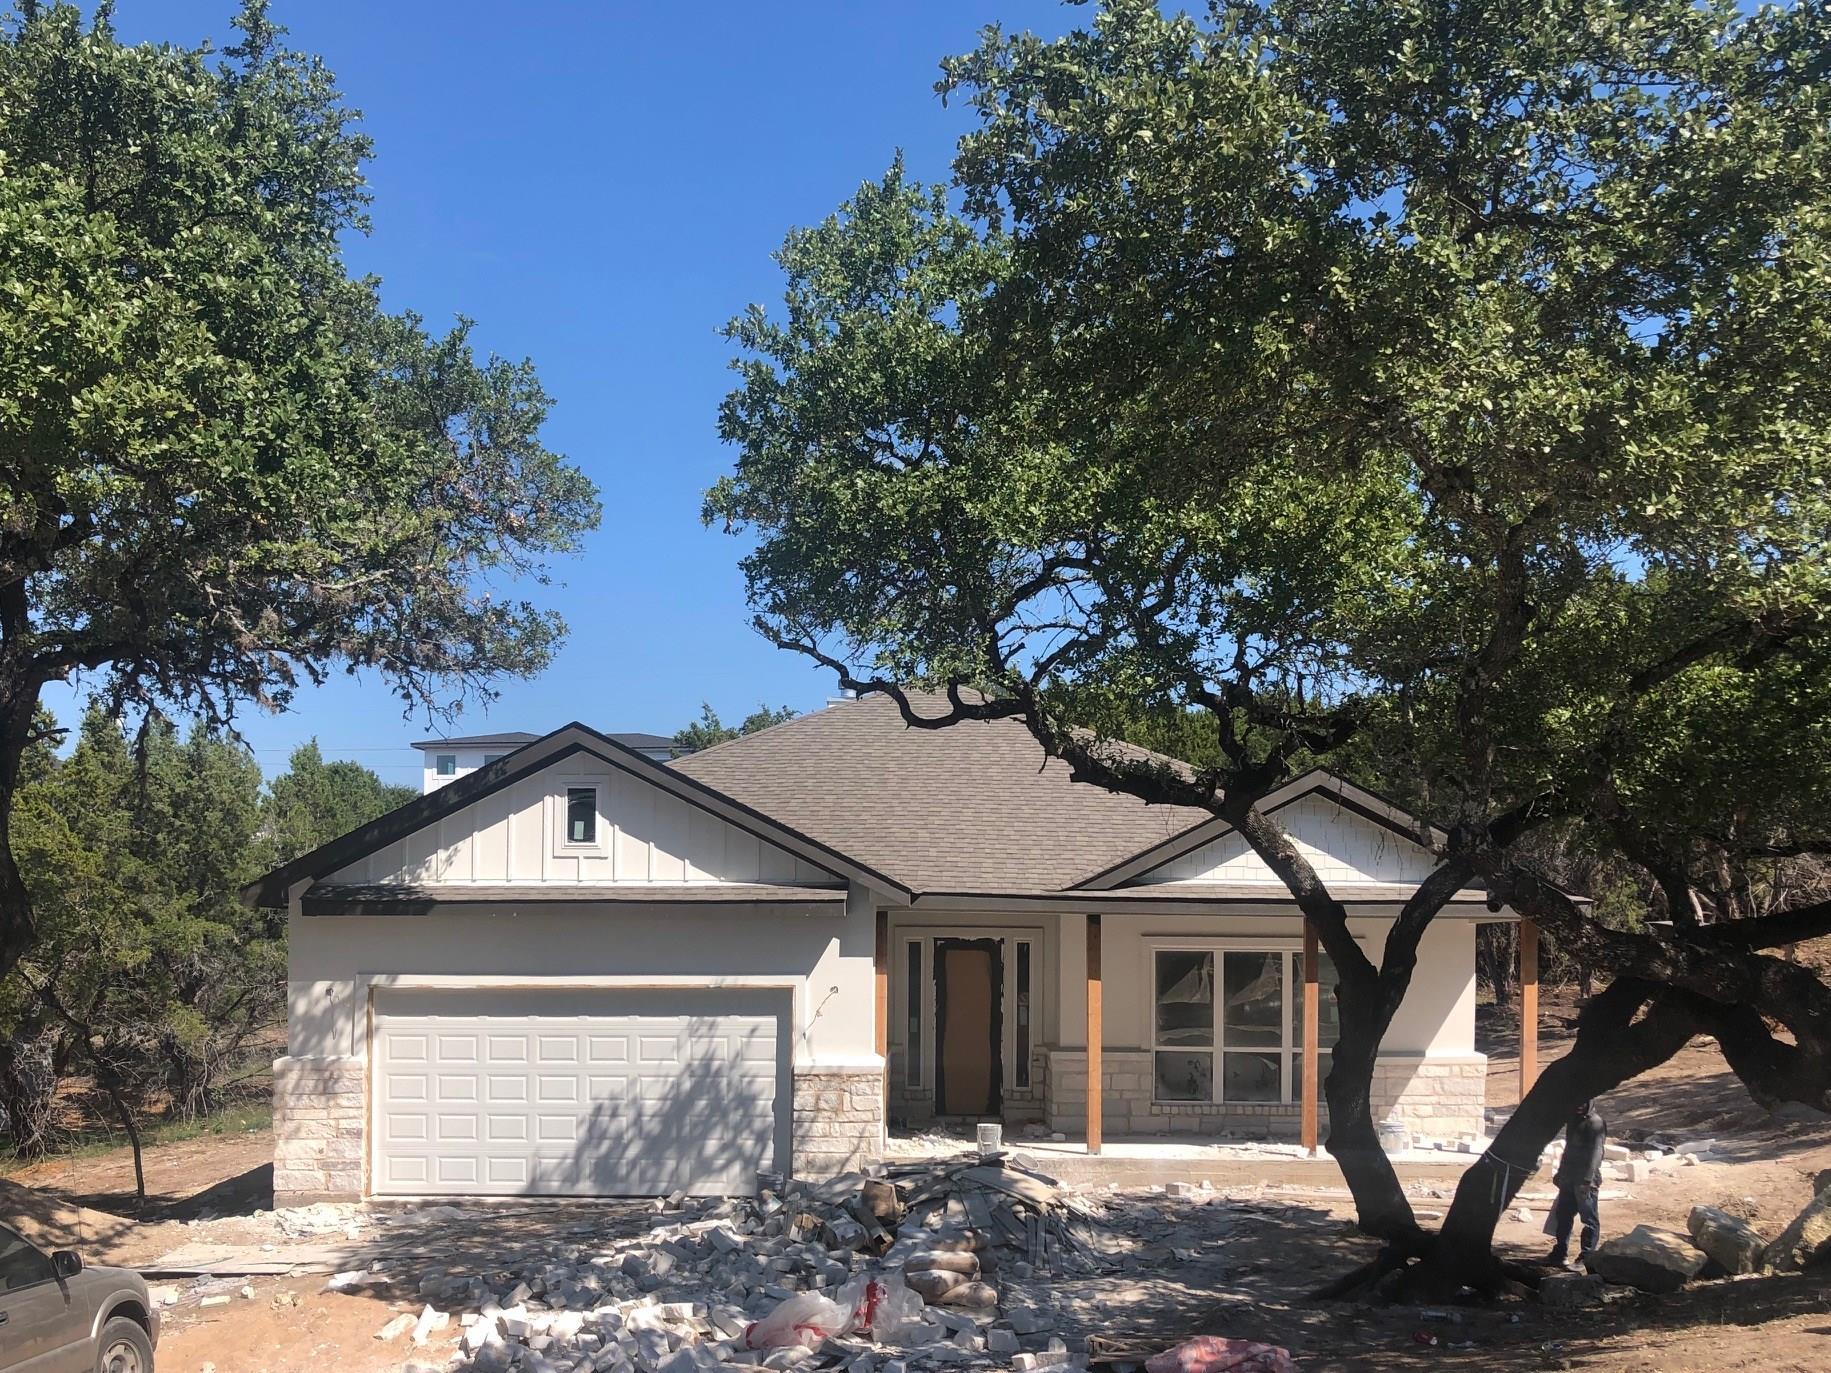 20810 Twisting Trail Property Photo - Lago Vista, TX real estate listing